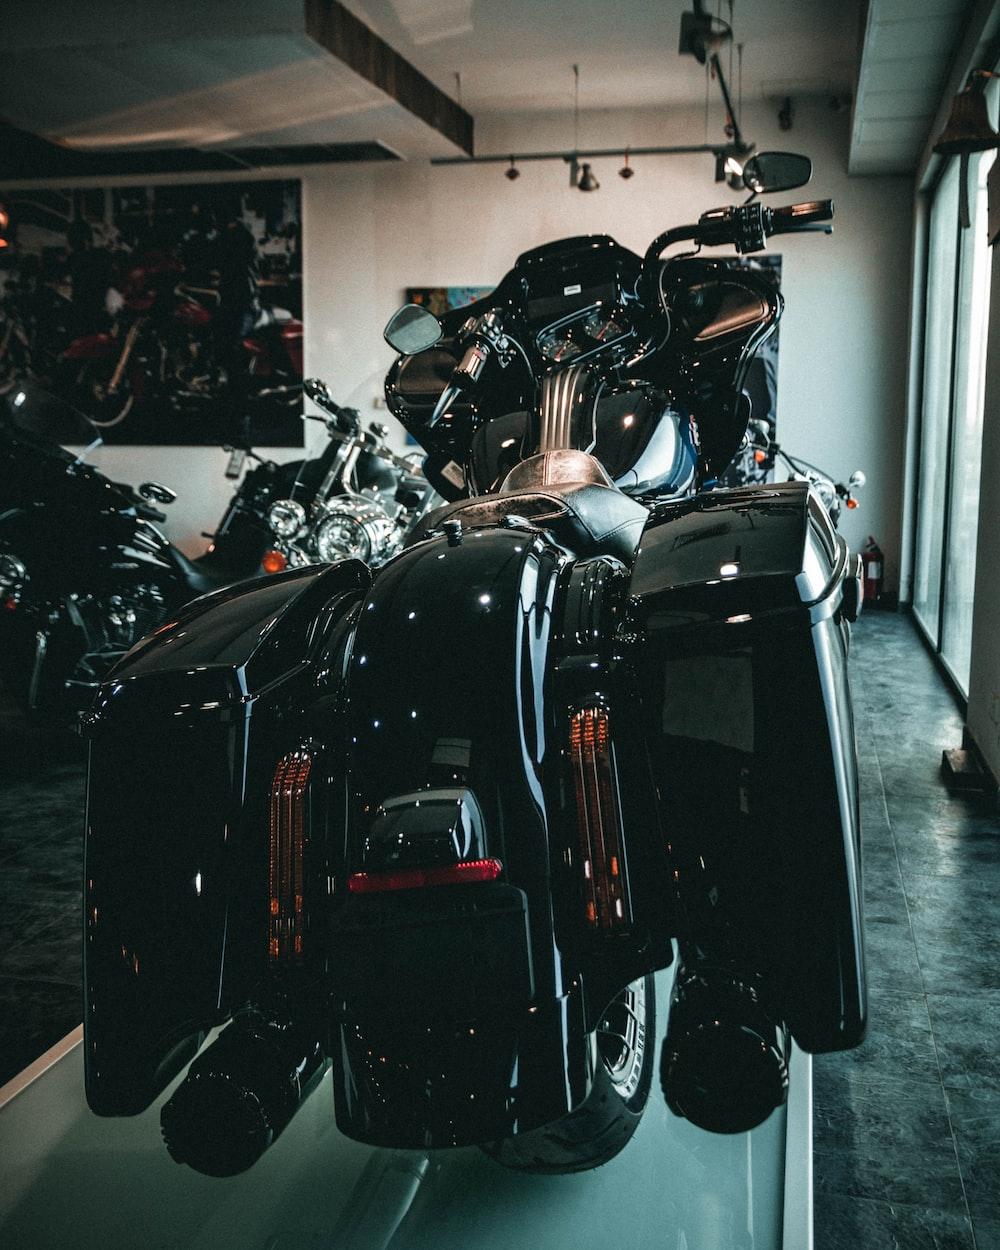 black motorcycle in a room